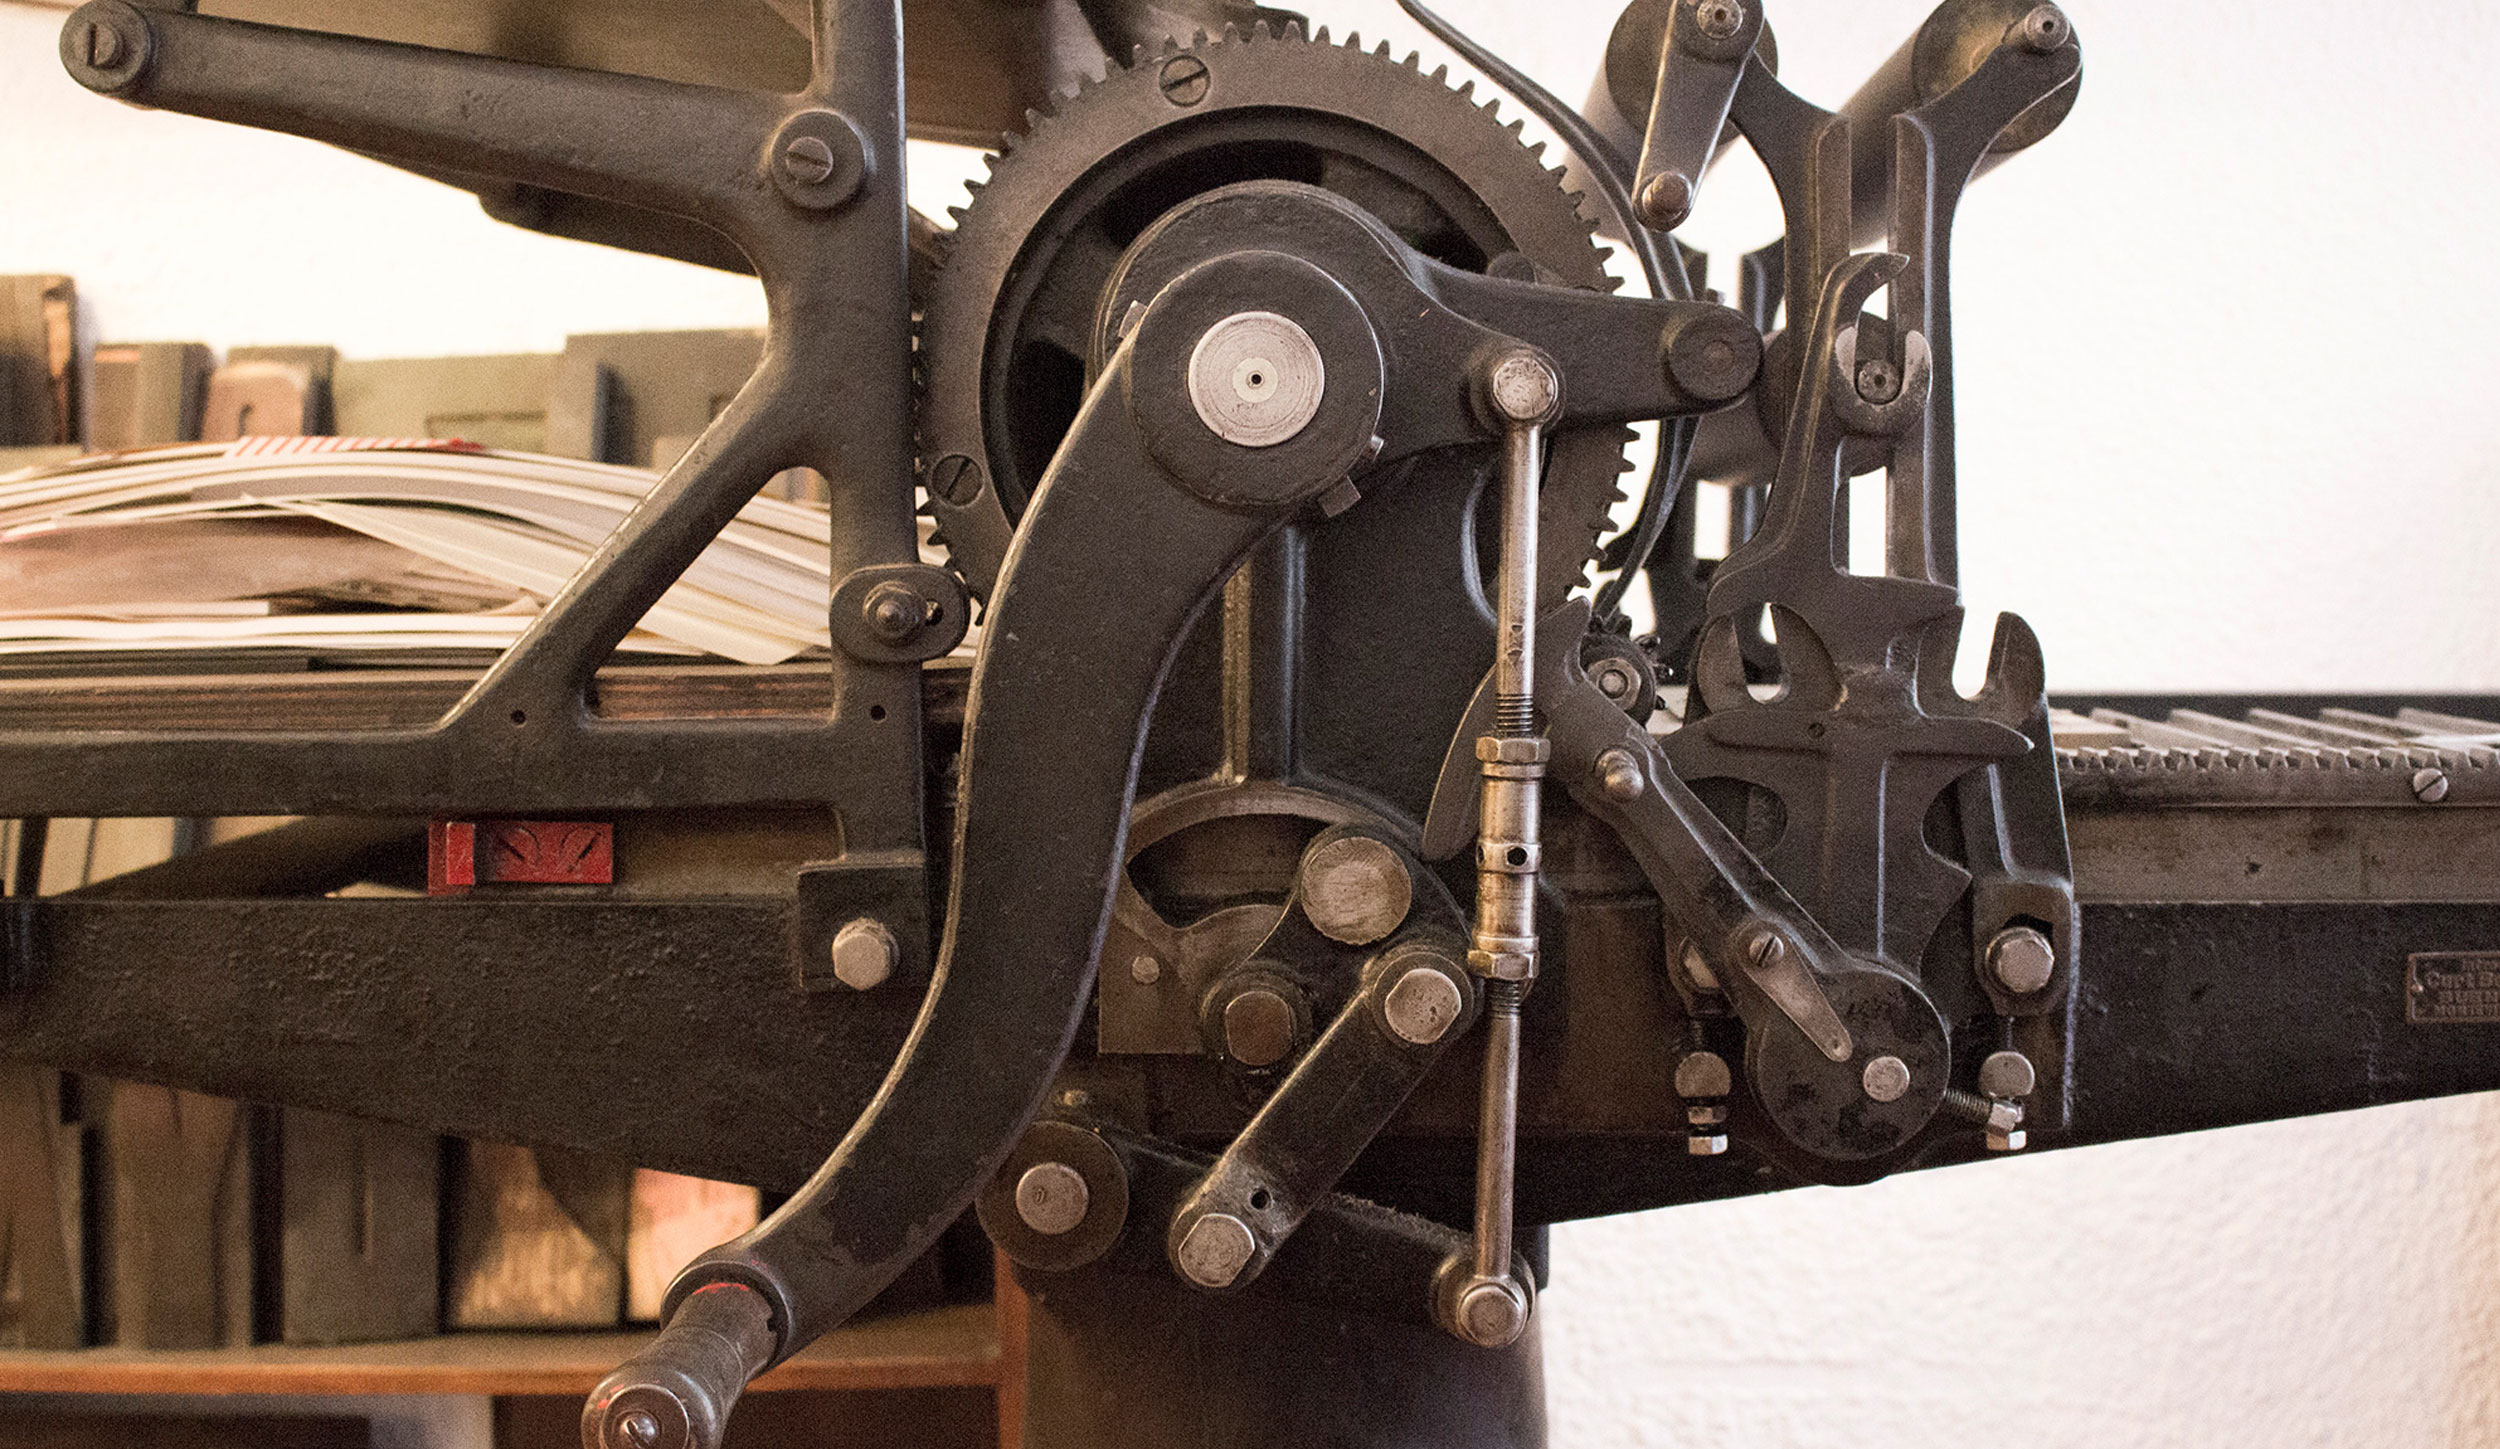 6-home-papel-principal-letterpress-imprenta-tipografica-artesanal.jpg